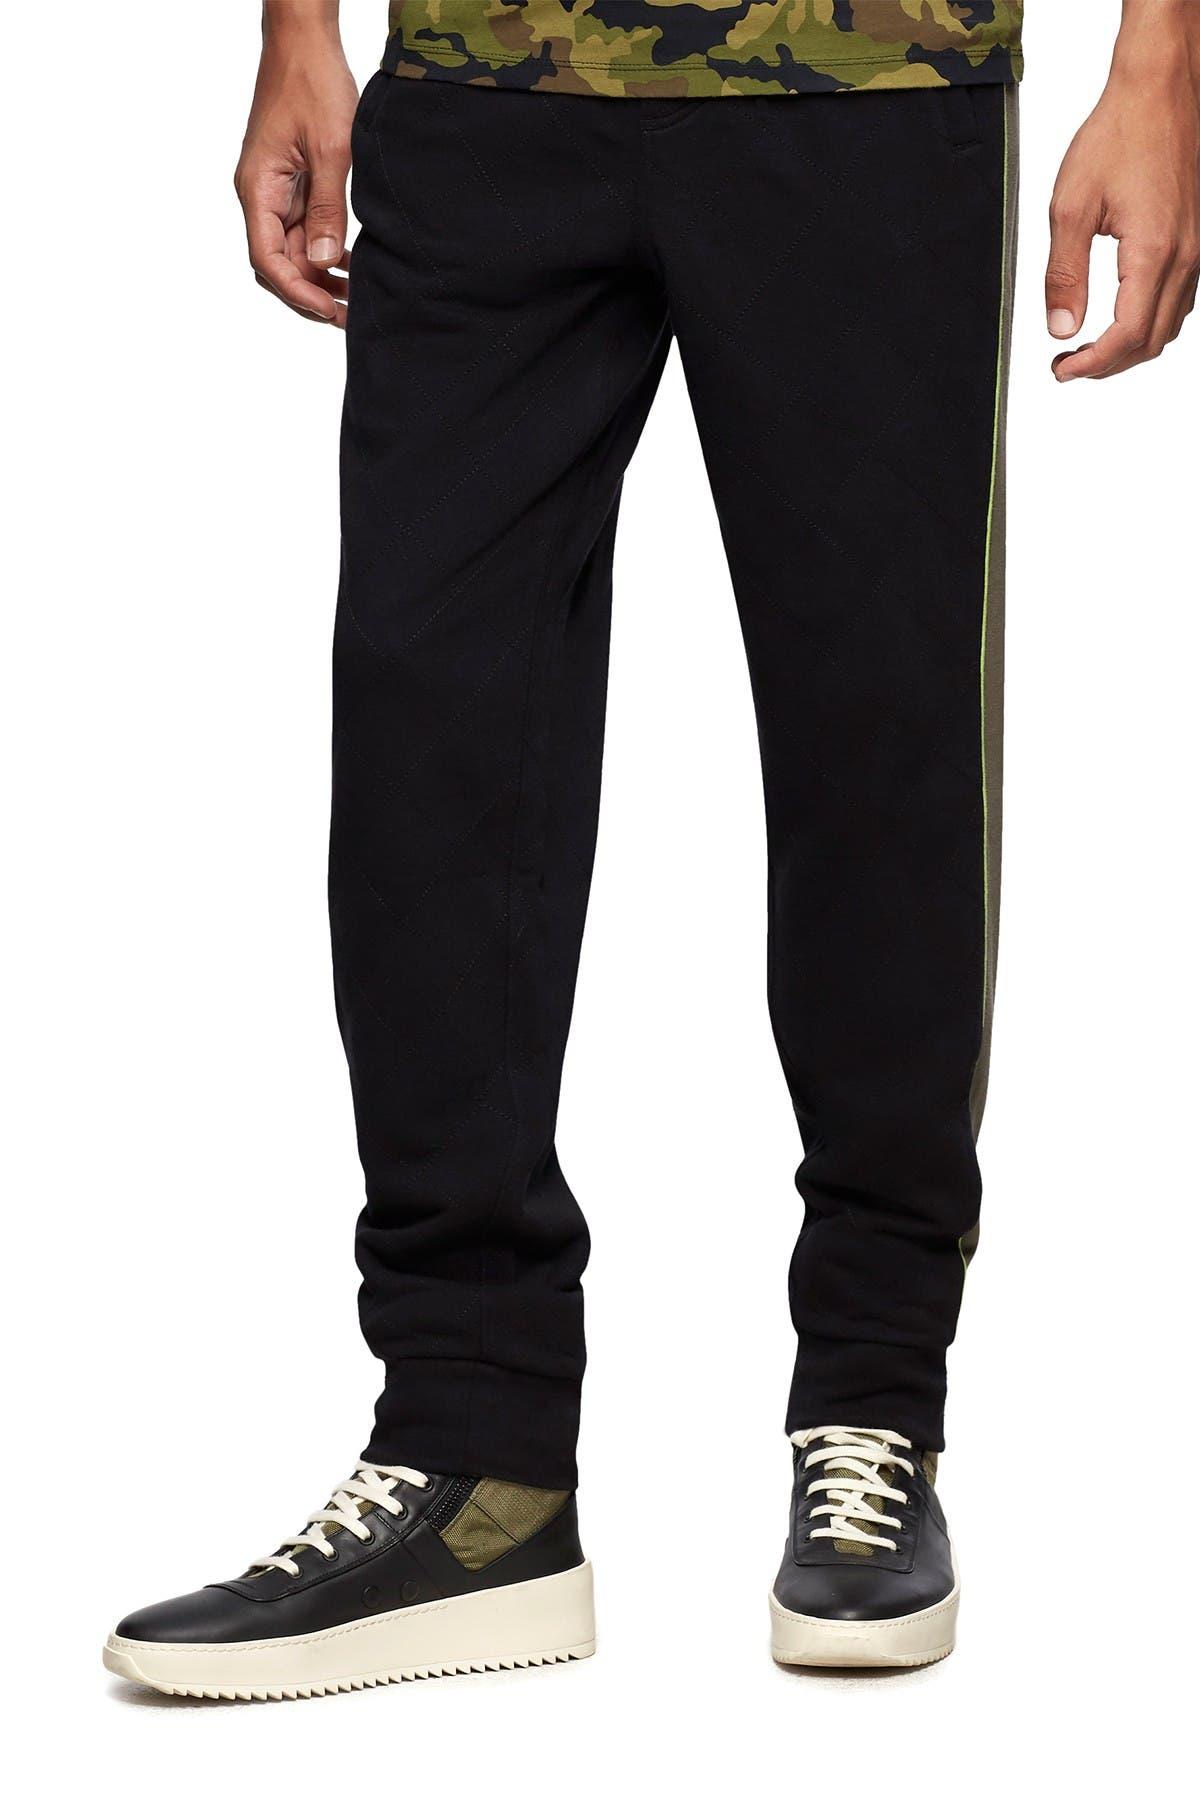 Image of True Religion Striped Jogger Sweatpants